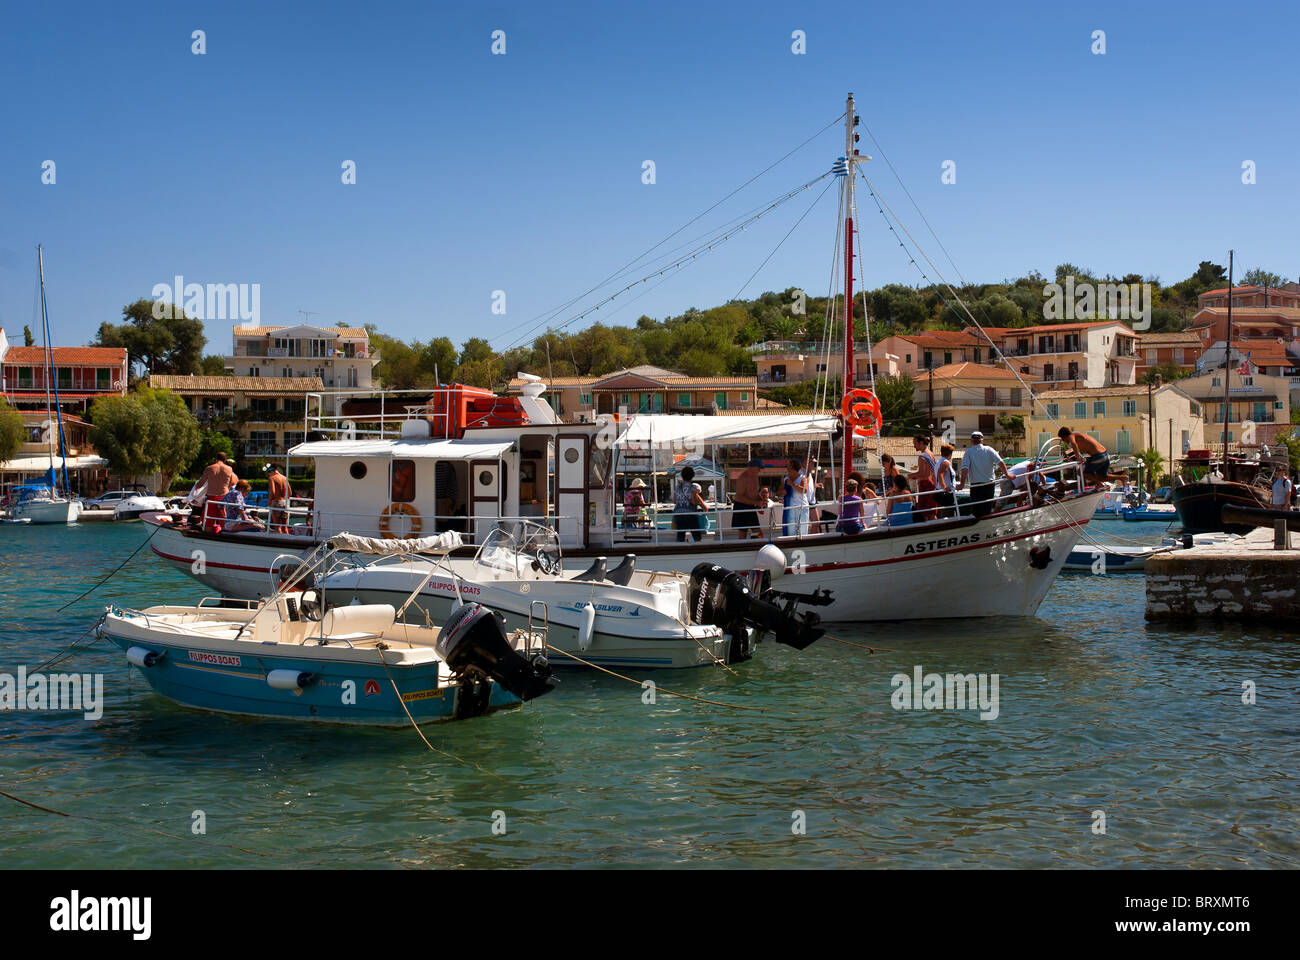 Tourist Boat in Kassiopi Harbour, Corfu, Ionian Islands Greece. Stock Photo